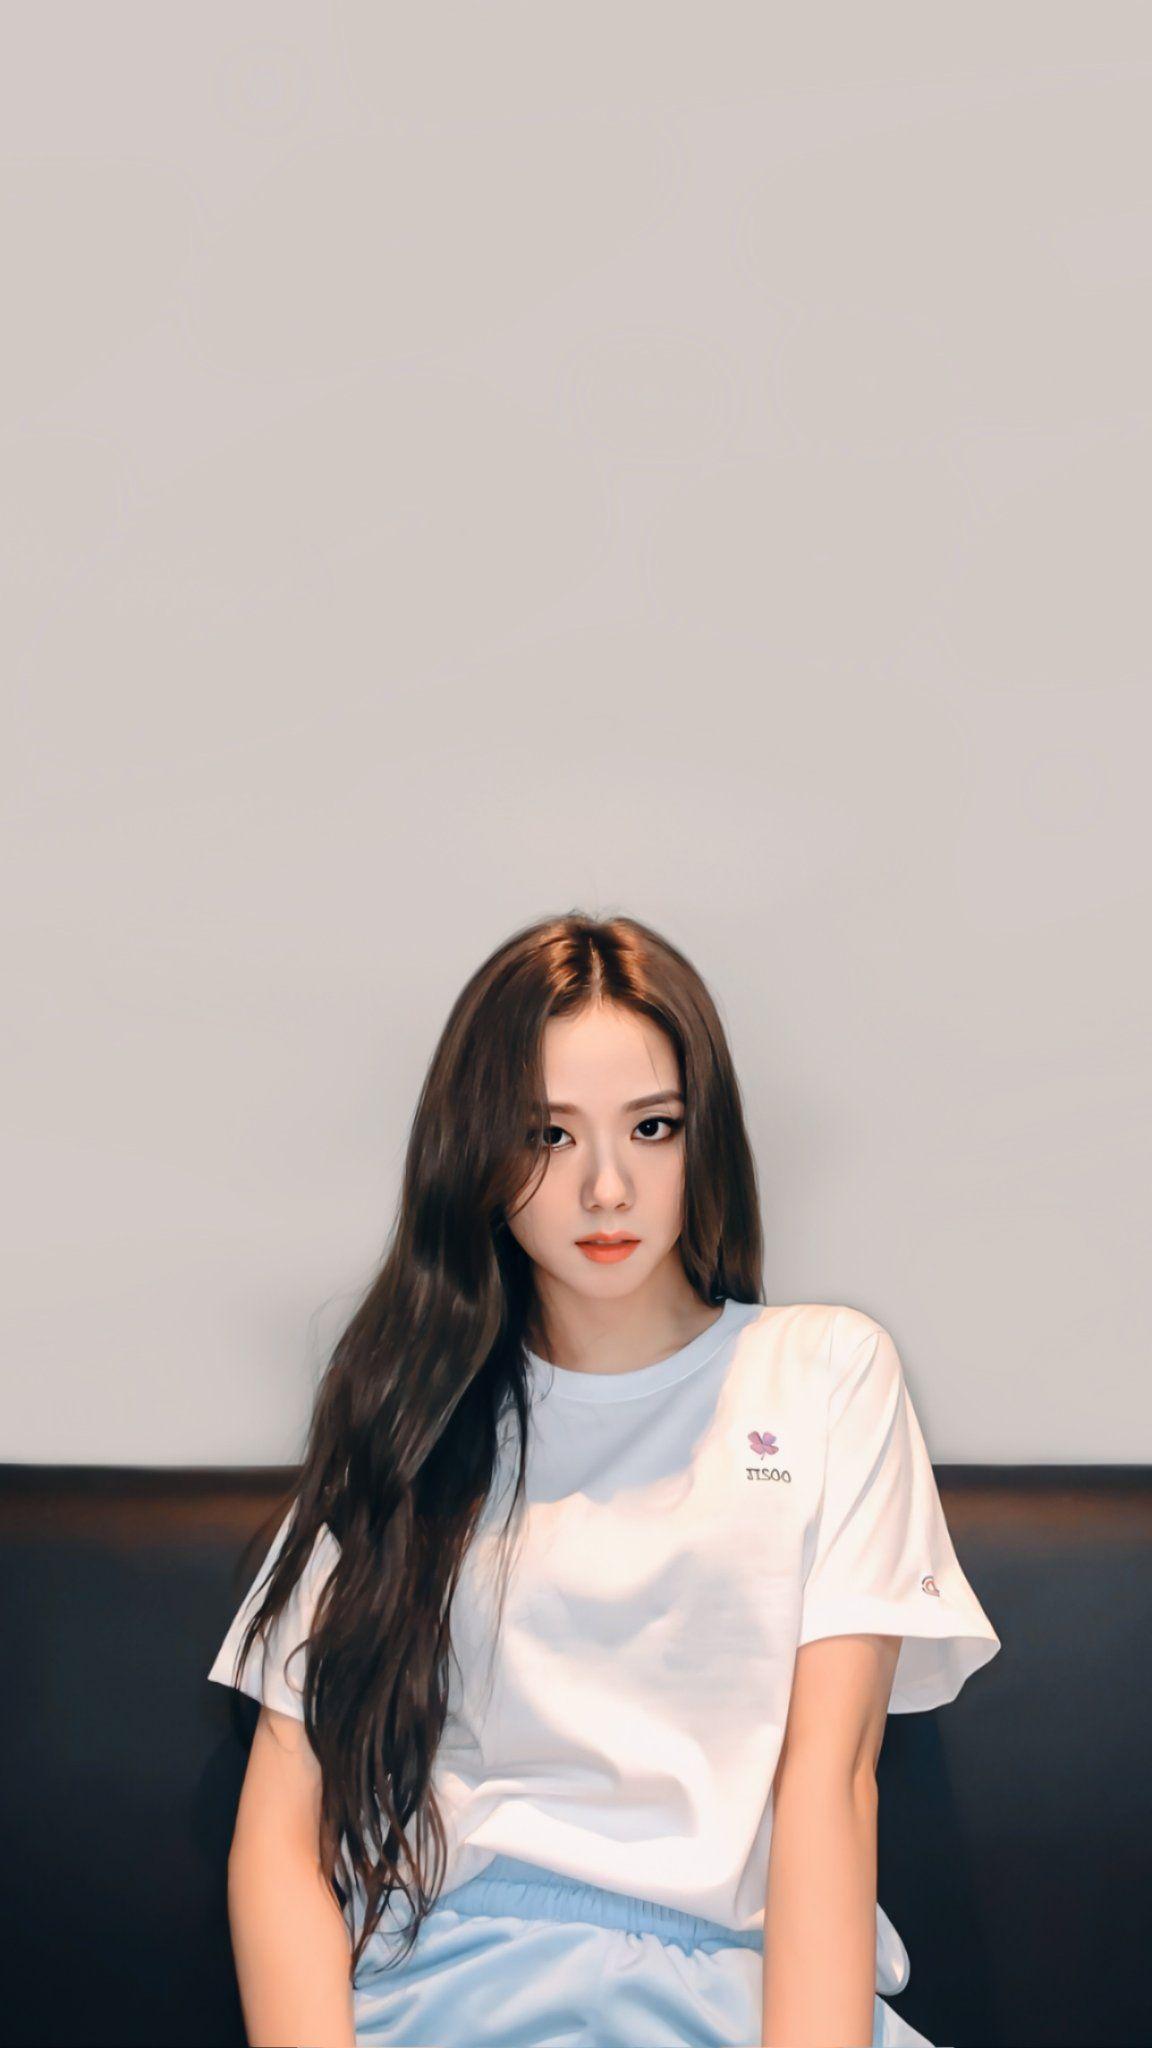 𝘑𝘐𝘚𝘖𝘖 𝘞𝘈𝘓𝘓𝘗𝘈𝘗𝘌𝘙𝘚 On Twitter Kpop Girls Blackpink Jisoo Black Pink Kpop